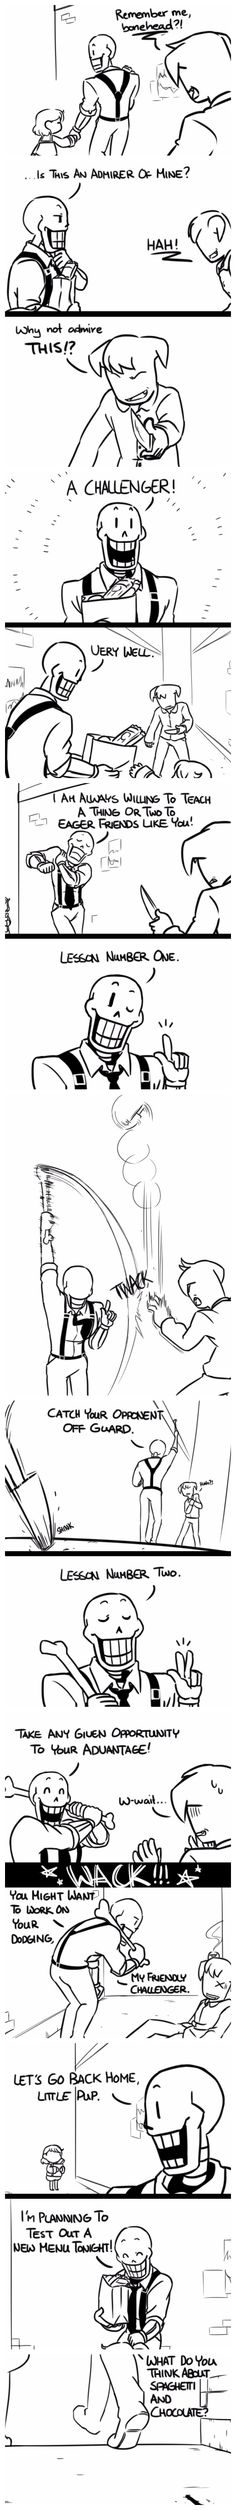 Frisk and Papyrus - MobsterUT AU - comic